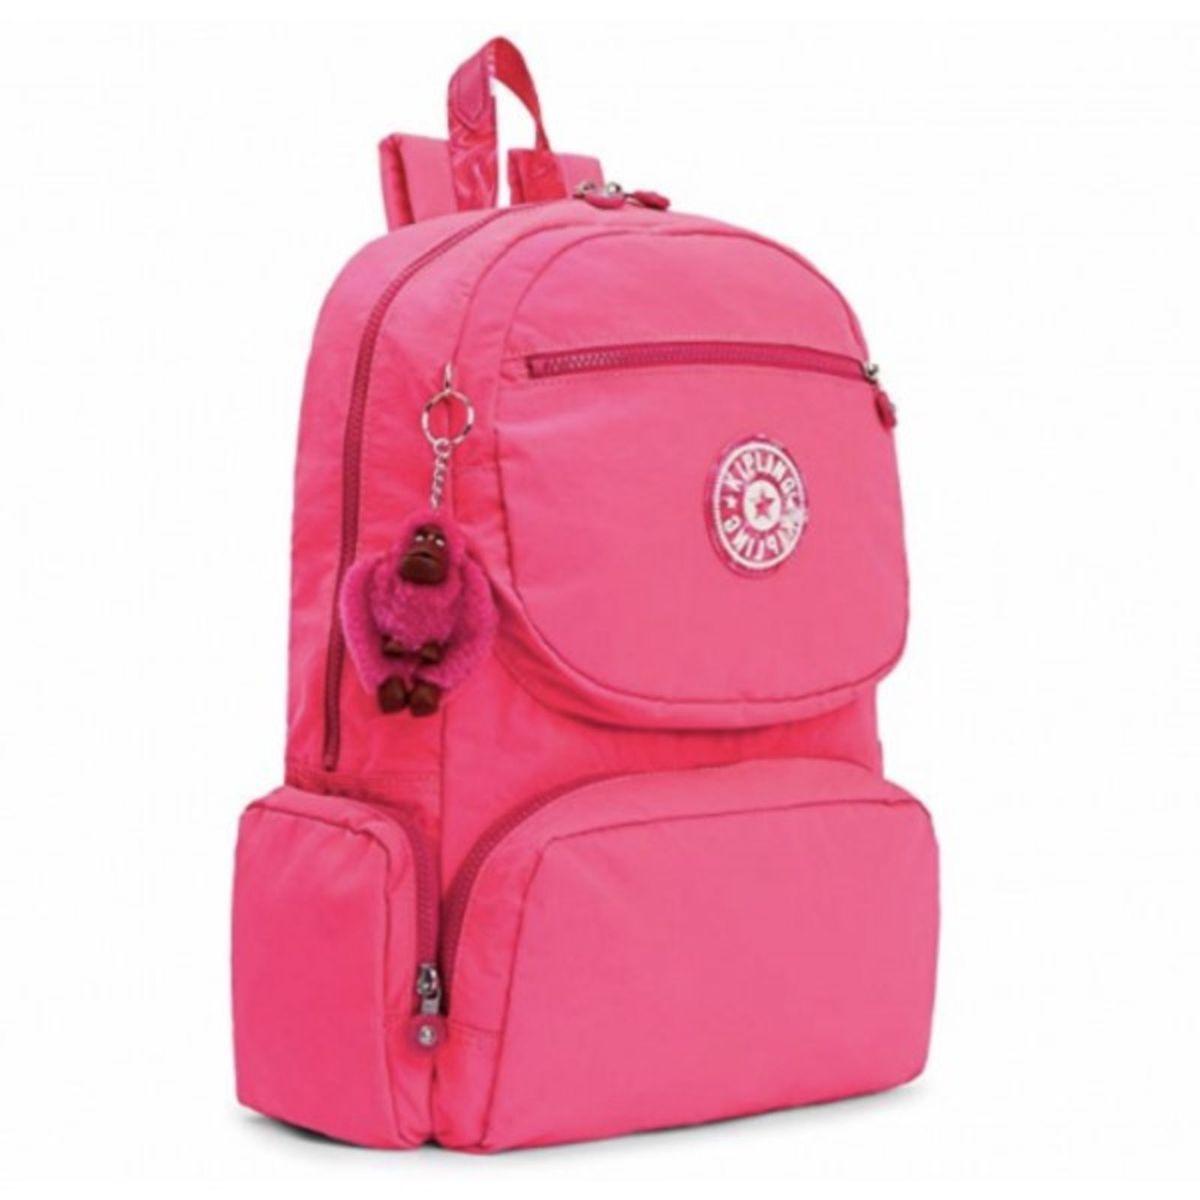 2459a06be Mochila Escolar Kipling Dawson Surfer Pink Lançamento   Mochila Feminina  Kipling Nunca Usado 30757343   enjoei